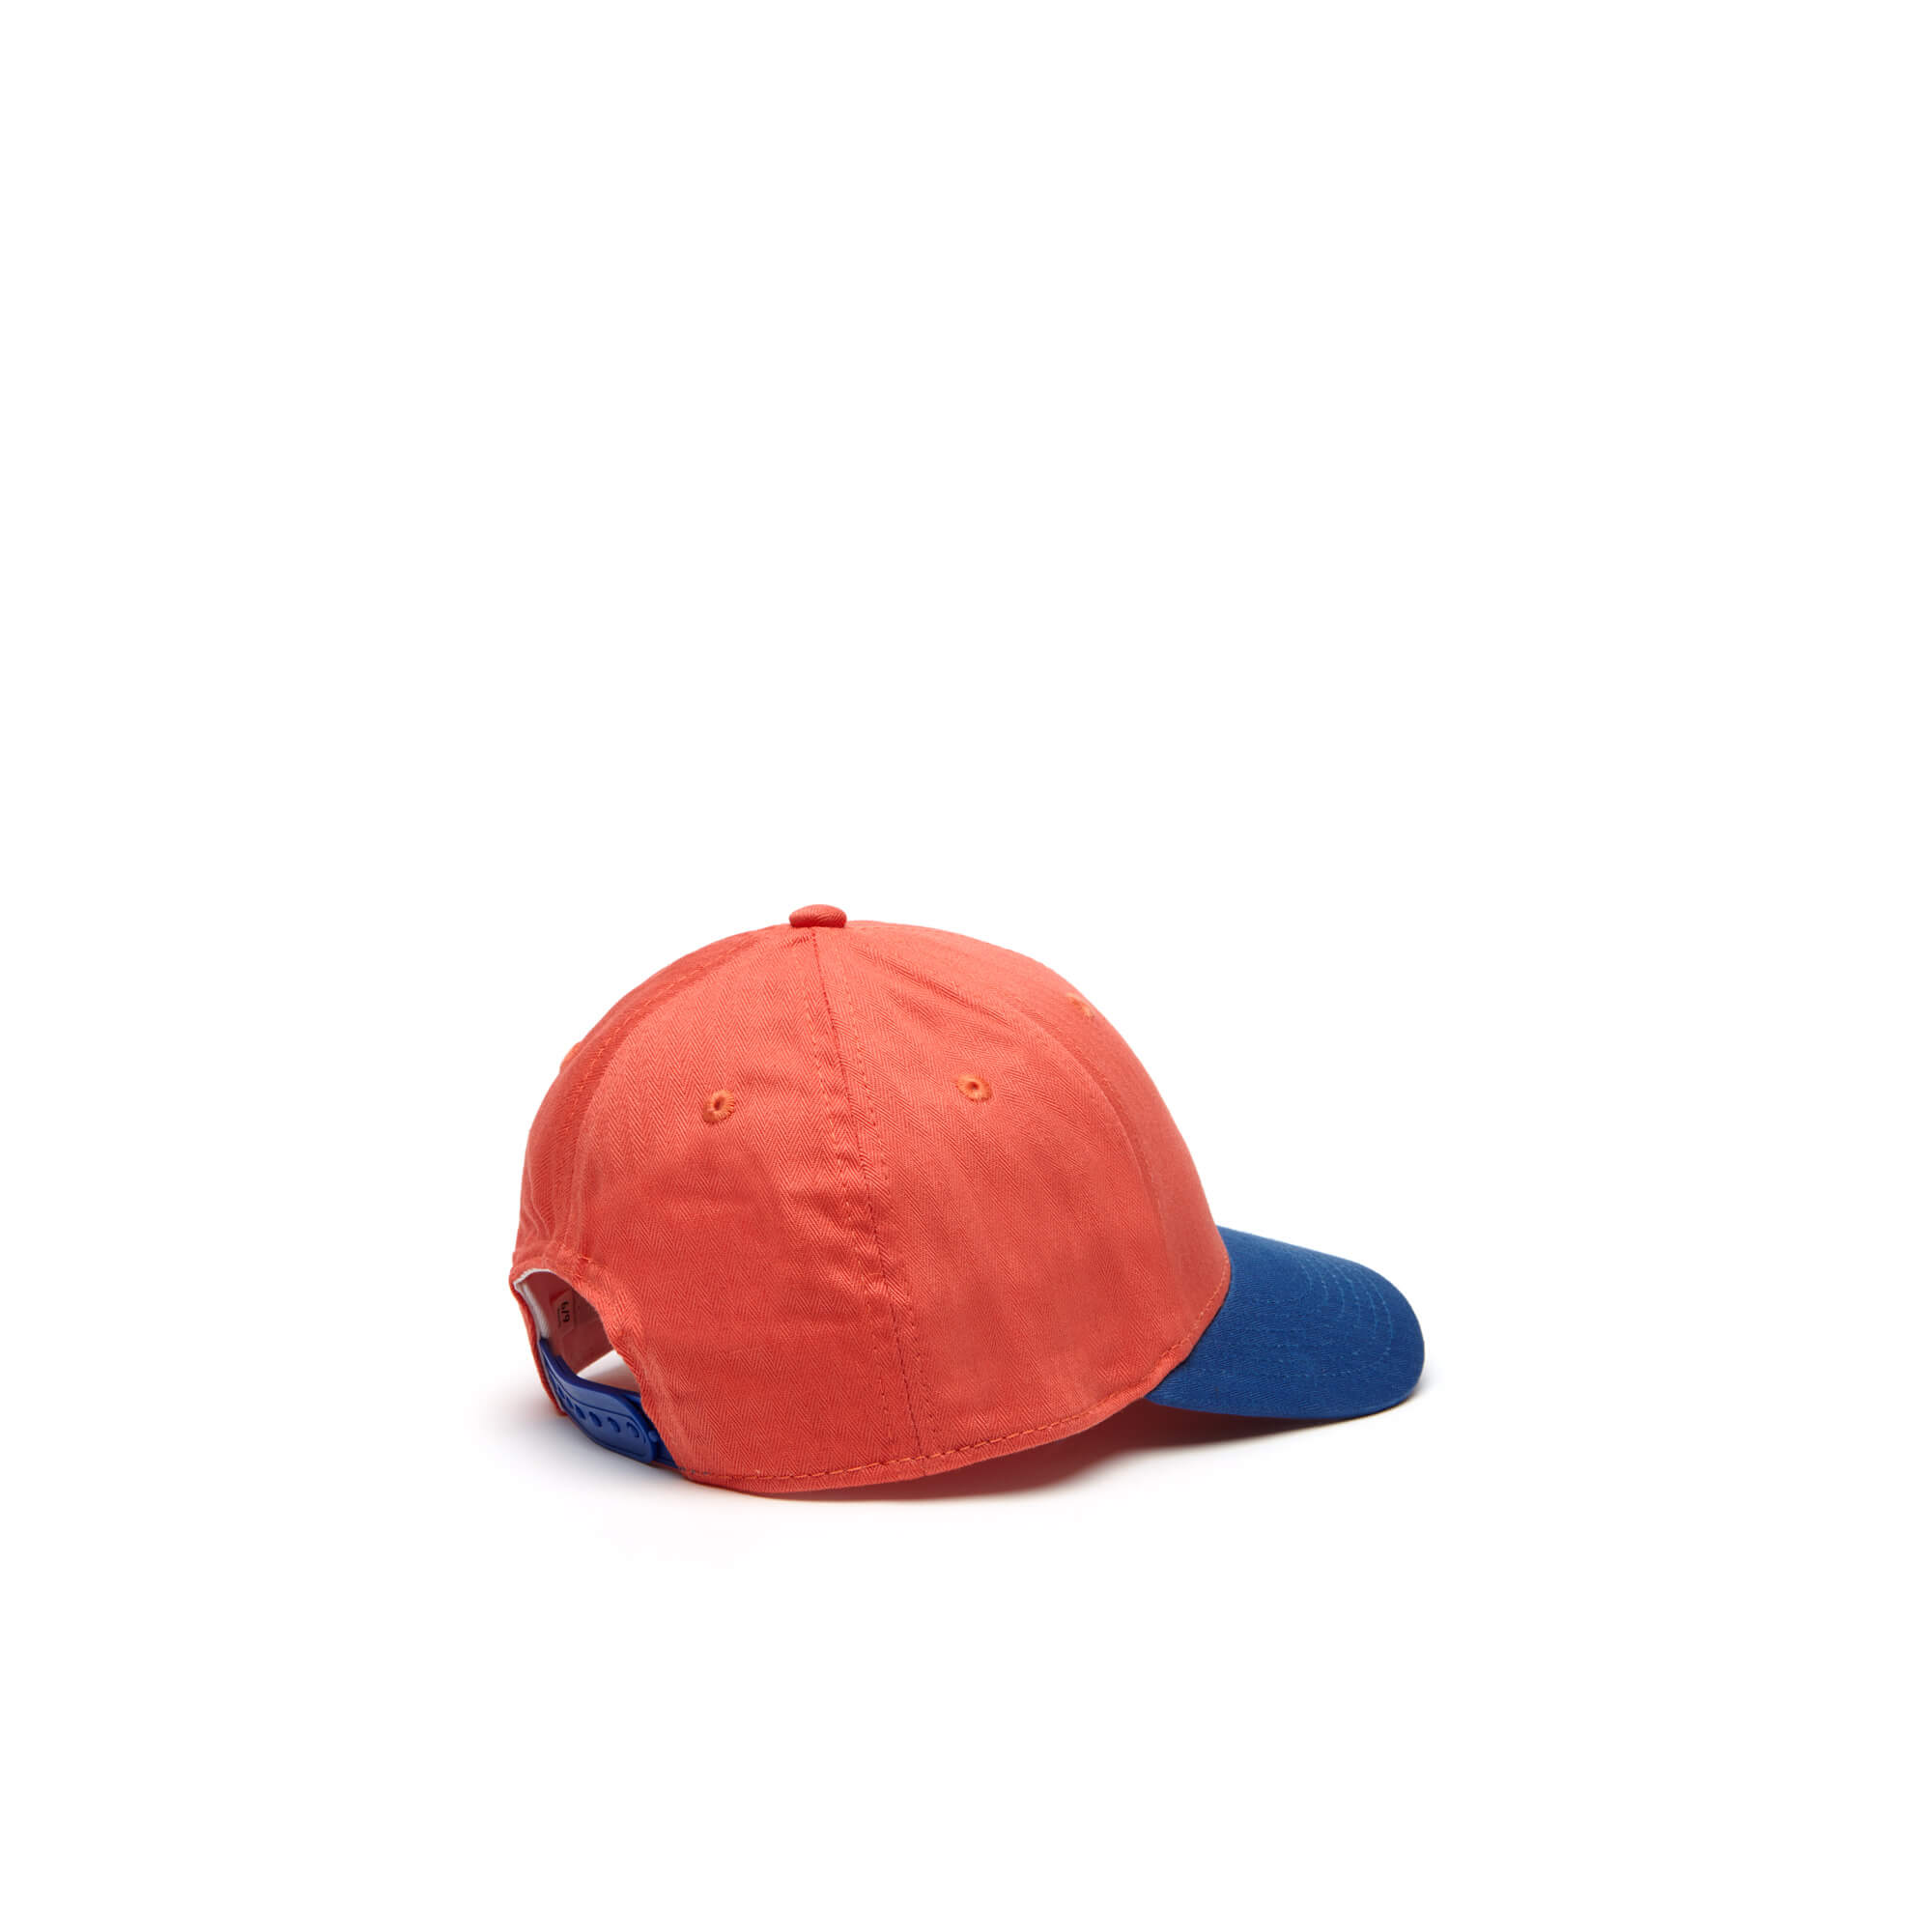 Lacoste Denim Turuncu Çocuk Şapka